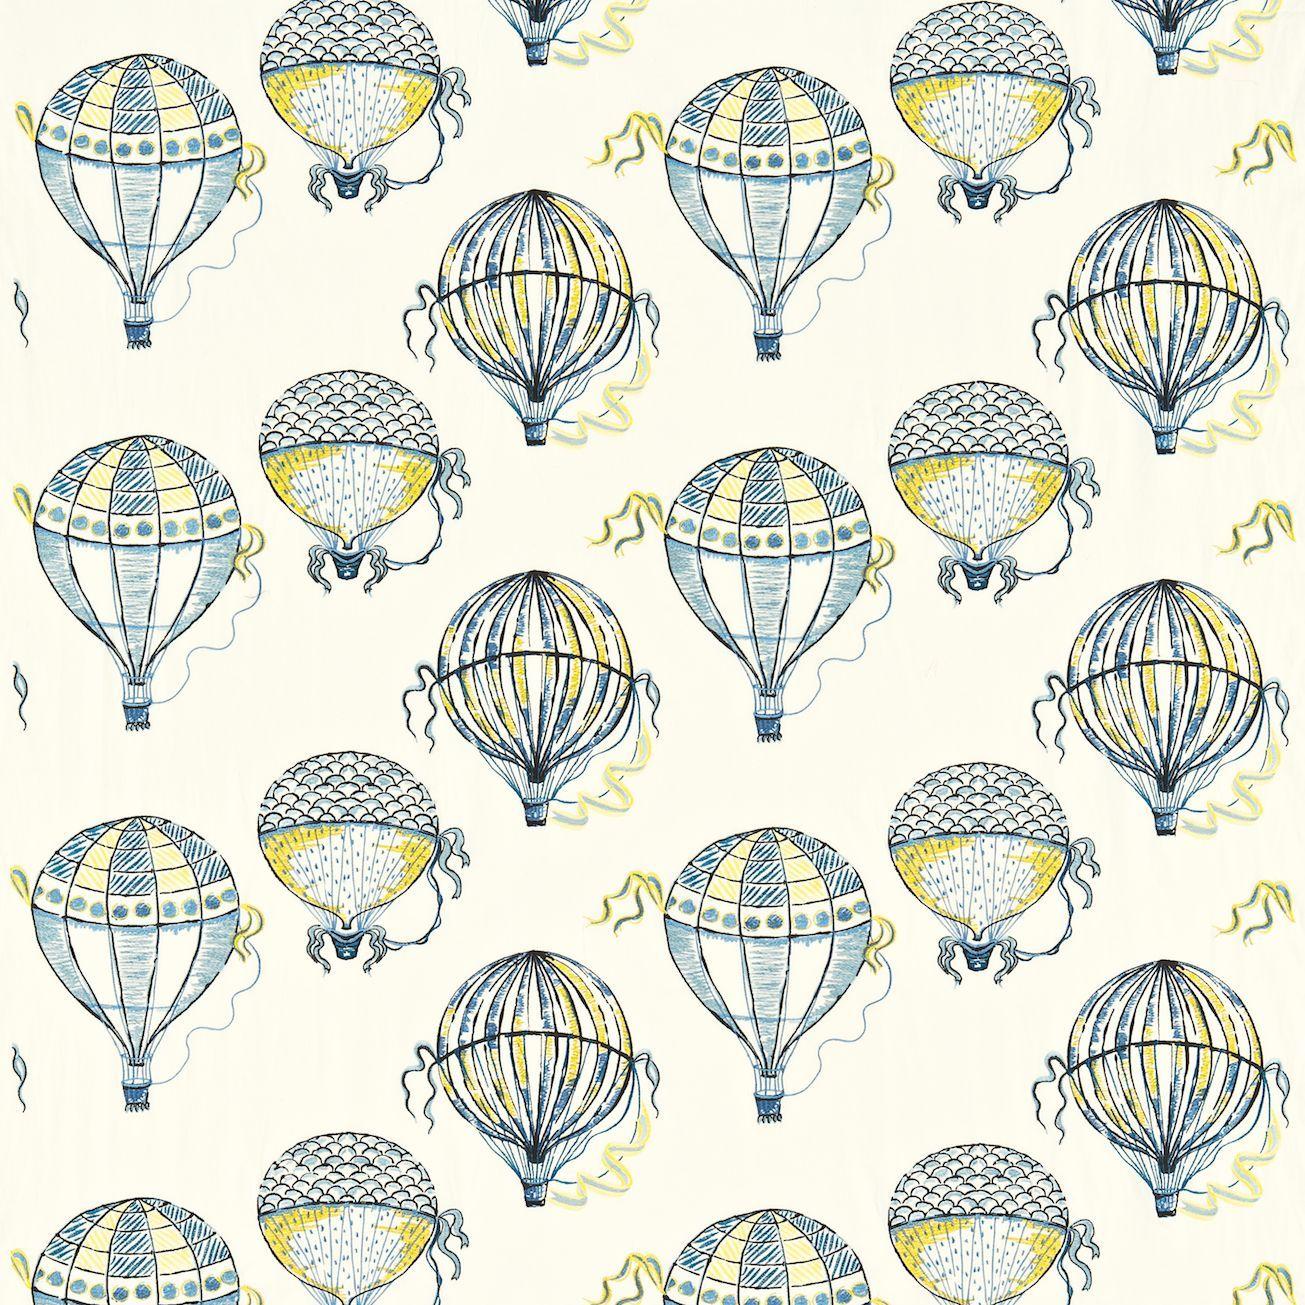 Sanderson - Balloons